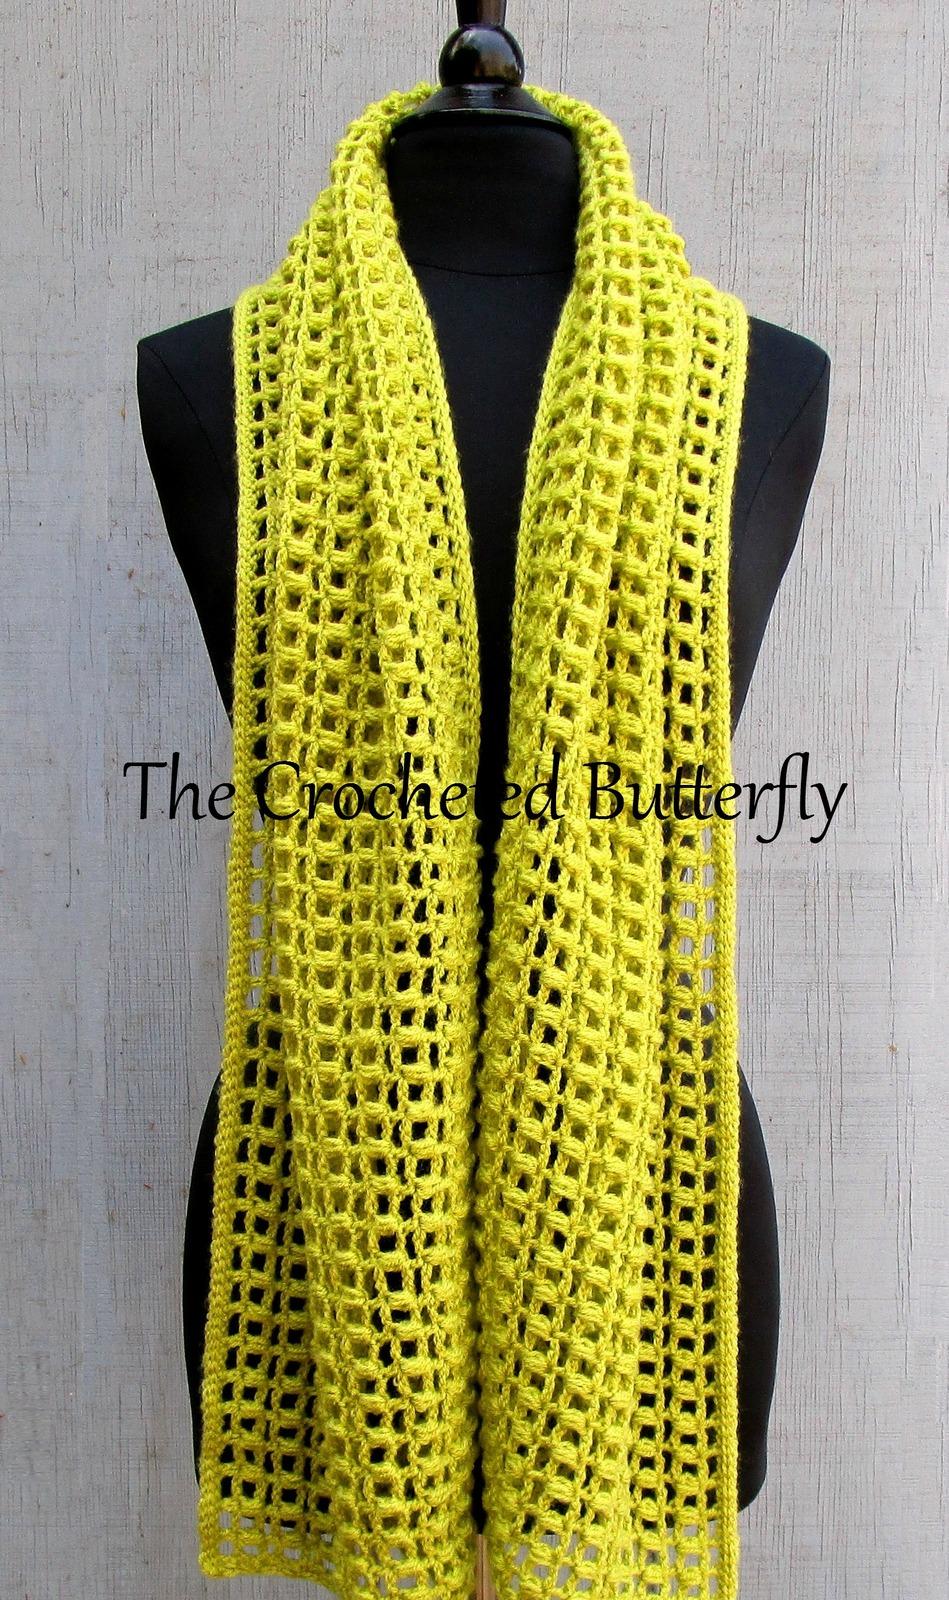 CROCHET PATTERN - Popcorn Shawl, crochet, women's accessories, fashion, handmade